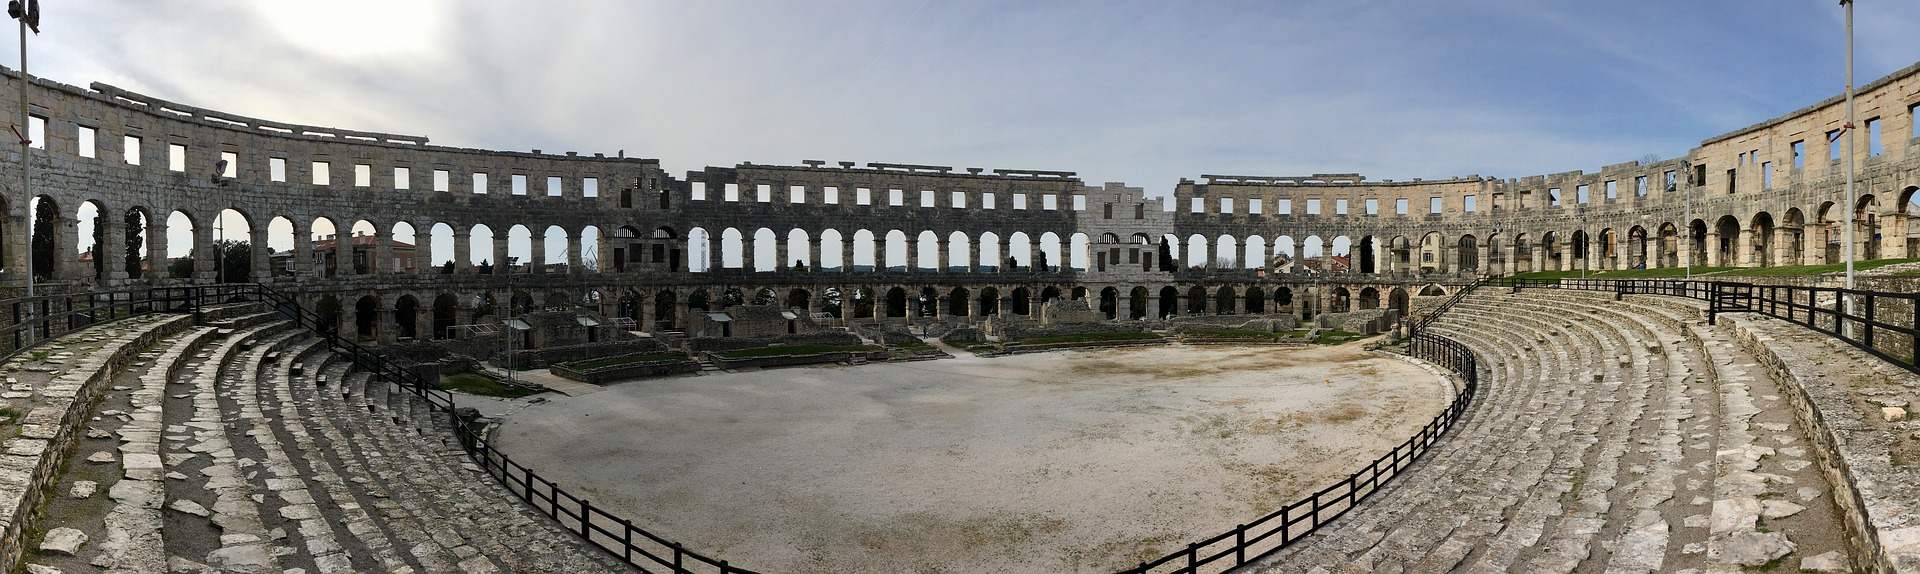 Nationalpark Brijuni bei Pula am Amphitheater I Flüge nach Istirien ab 7,99€